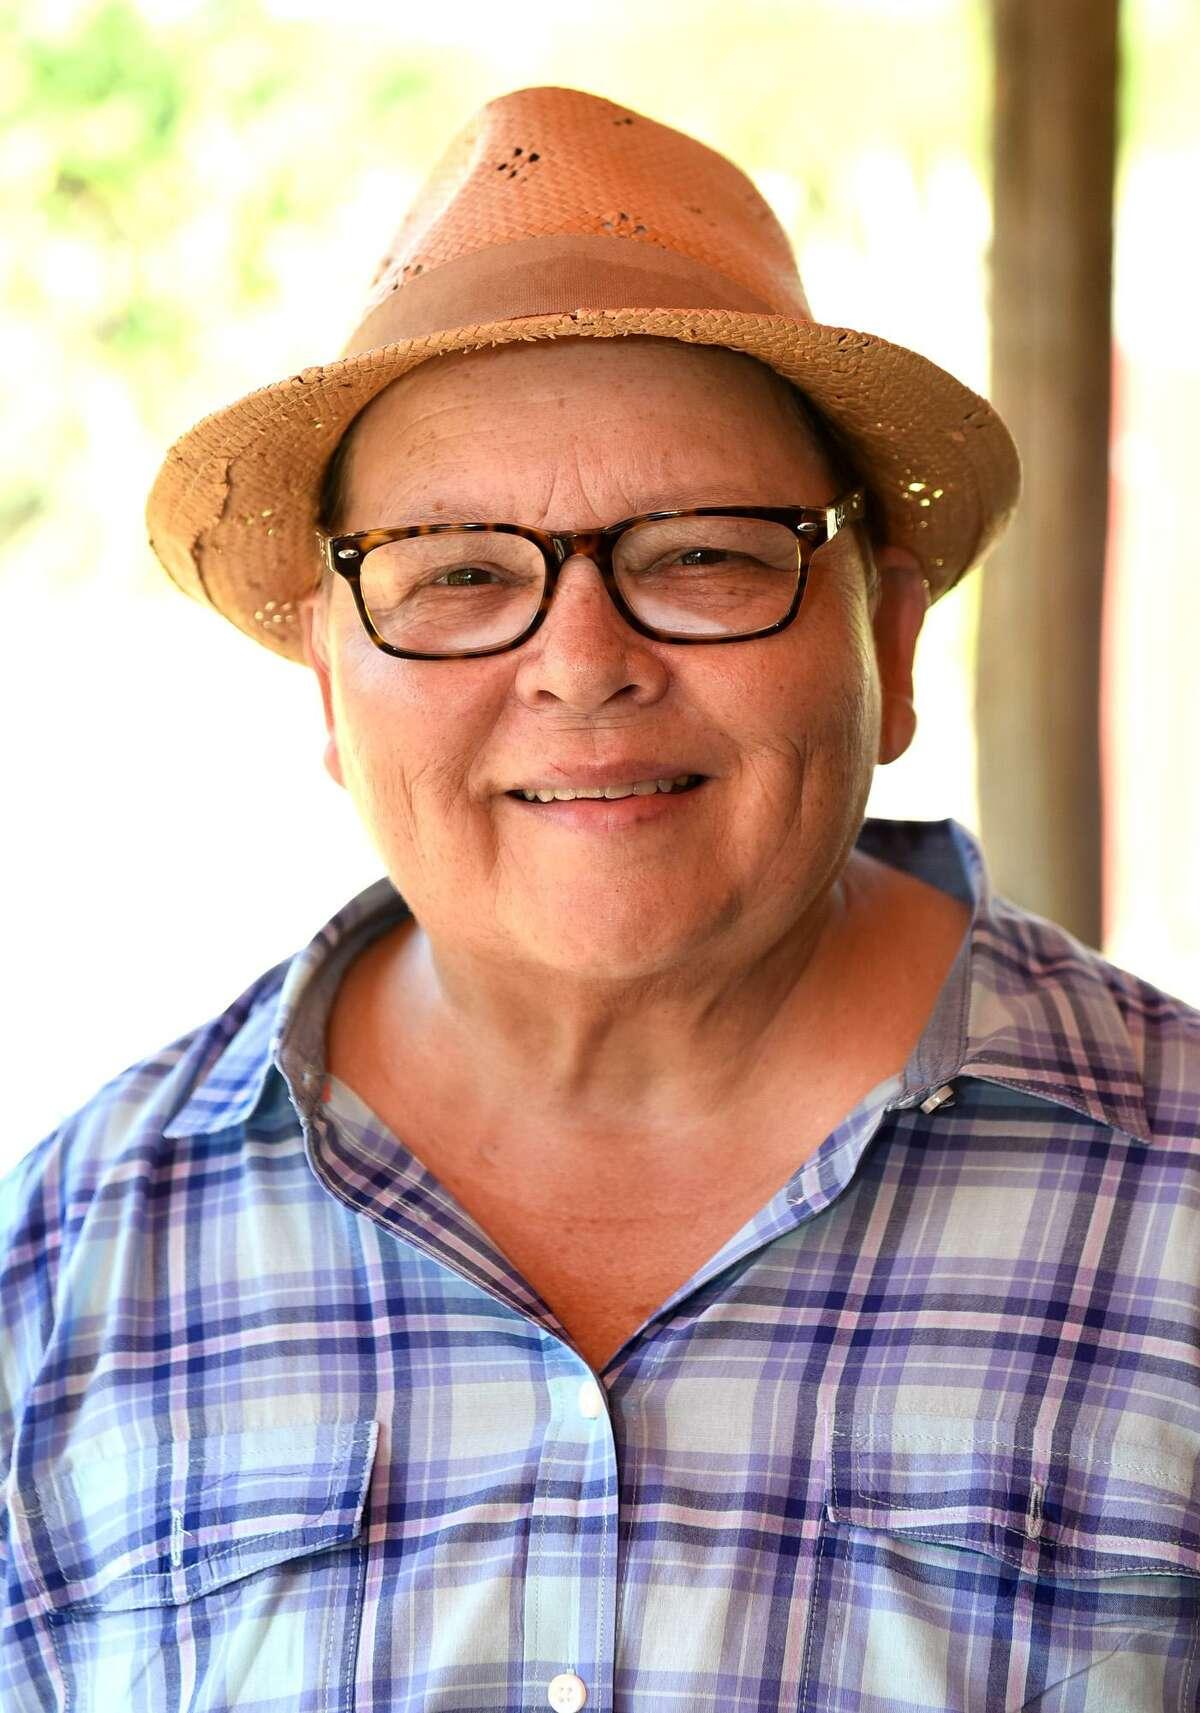 Meg Guerra poses for a headshot outside her ranch home in San Ygnacio, Texas on Tuesday, June 27, 2017.